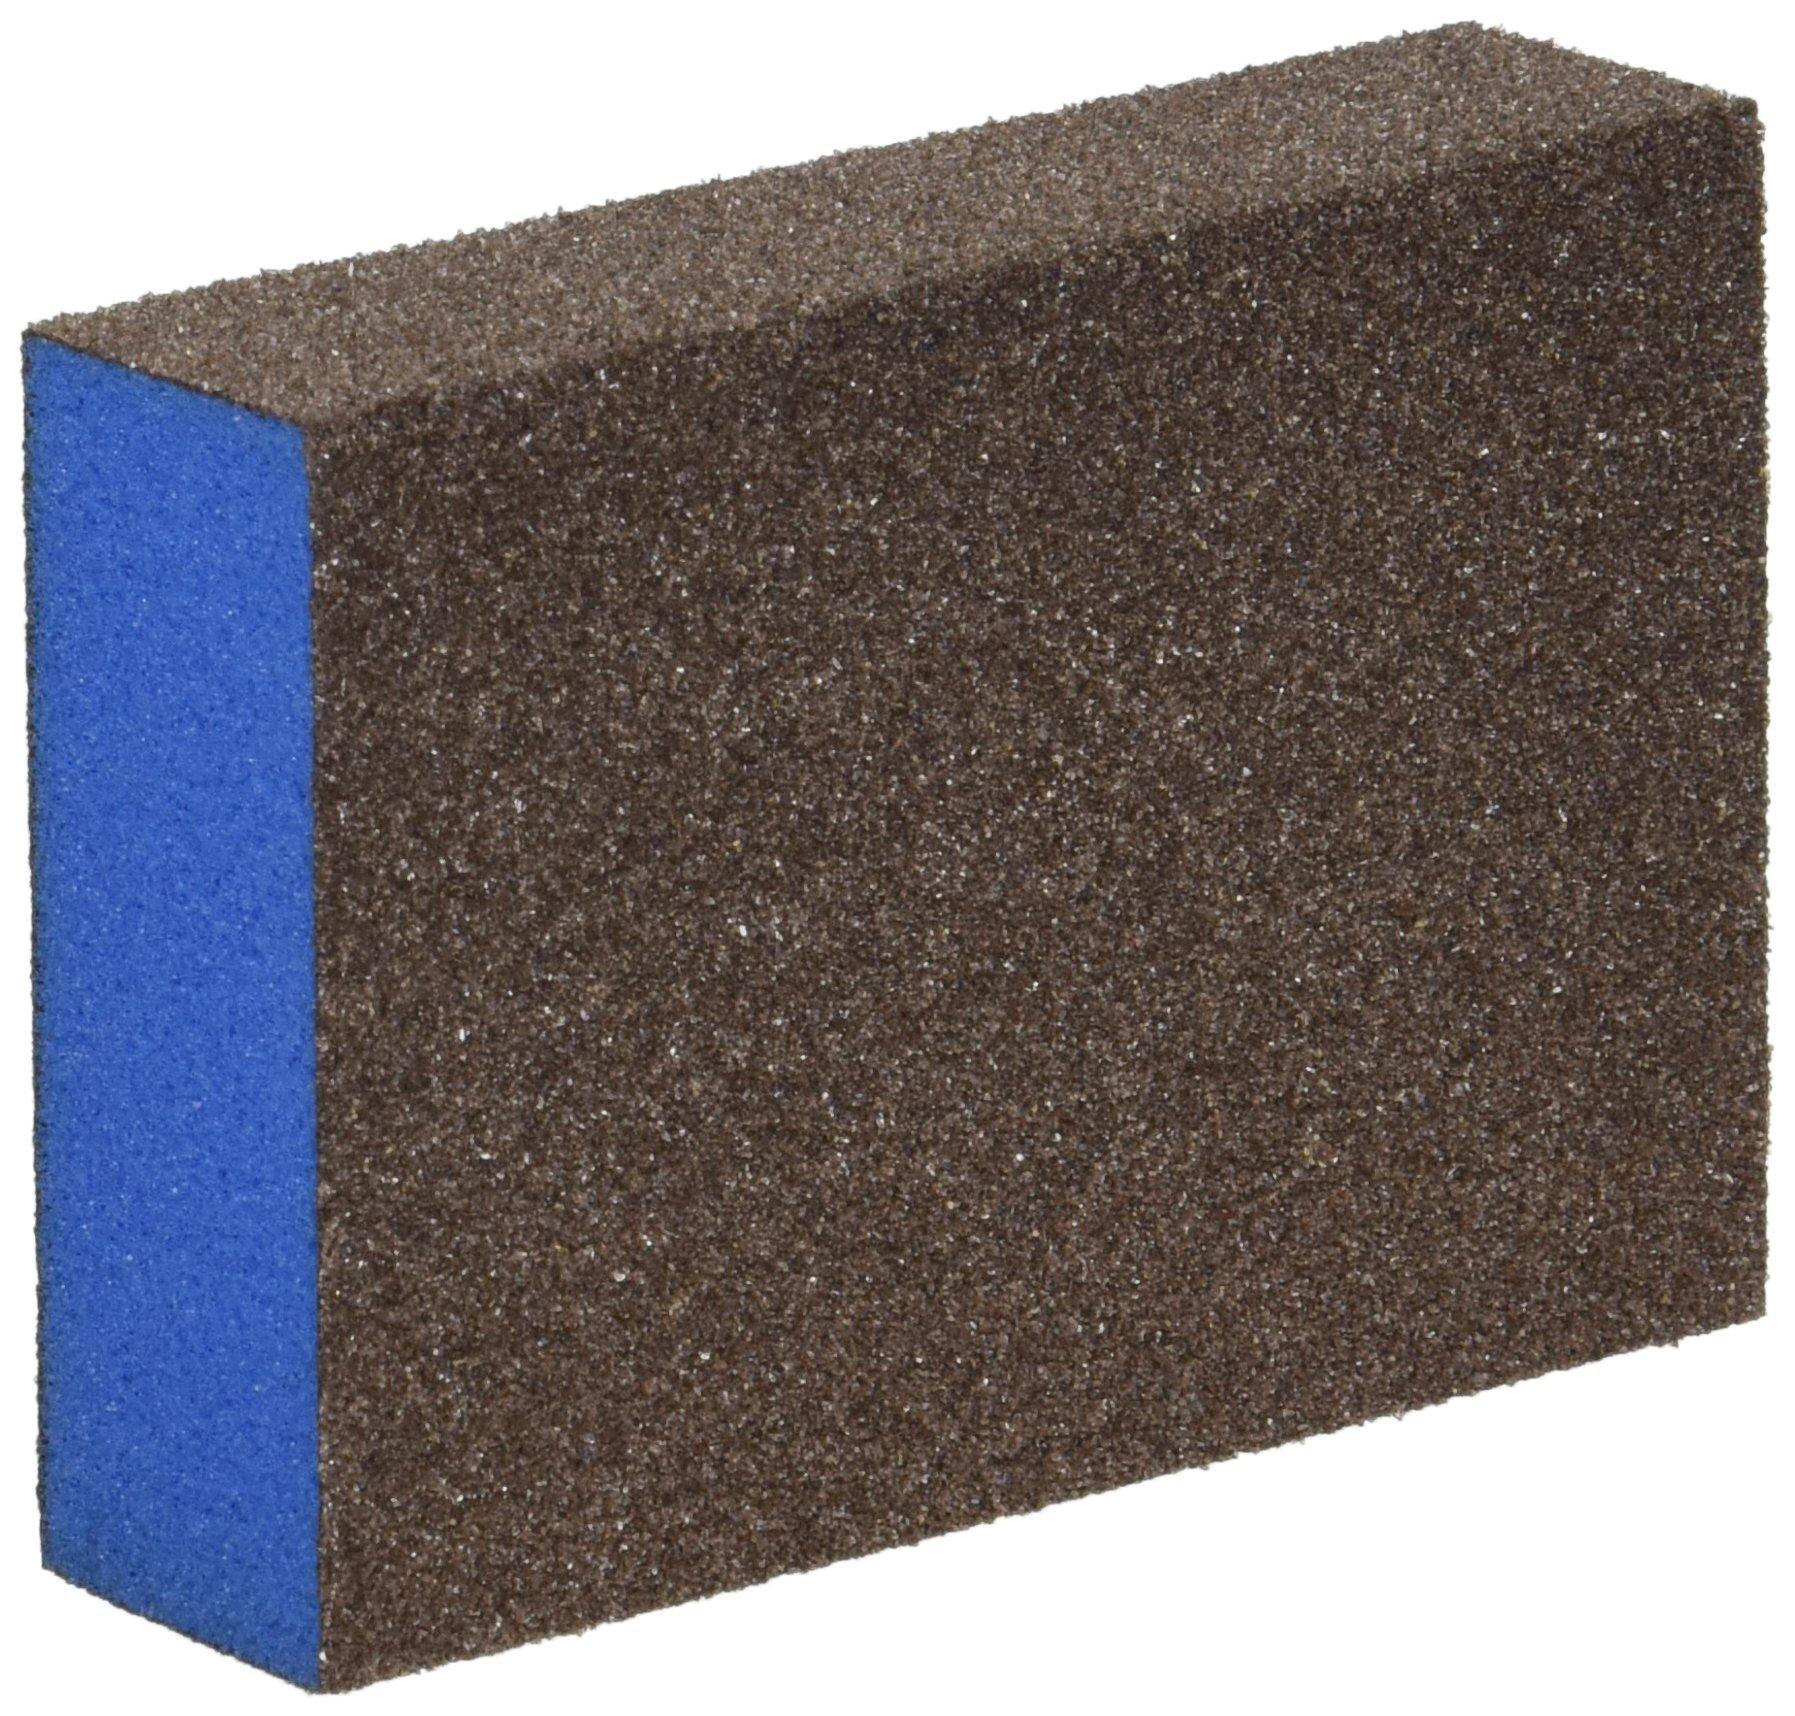 Webb Abrasives 601007 Z-Foam Block Sanding Sponges, Medium/Fine Grit, 2 5/8'' x 3 7/8'' x 1'' (24-Pack)